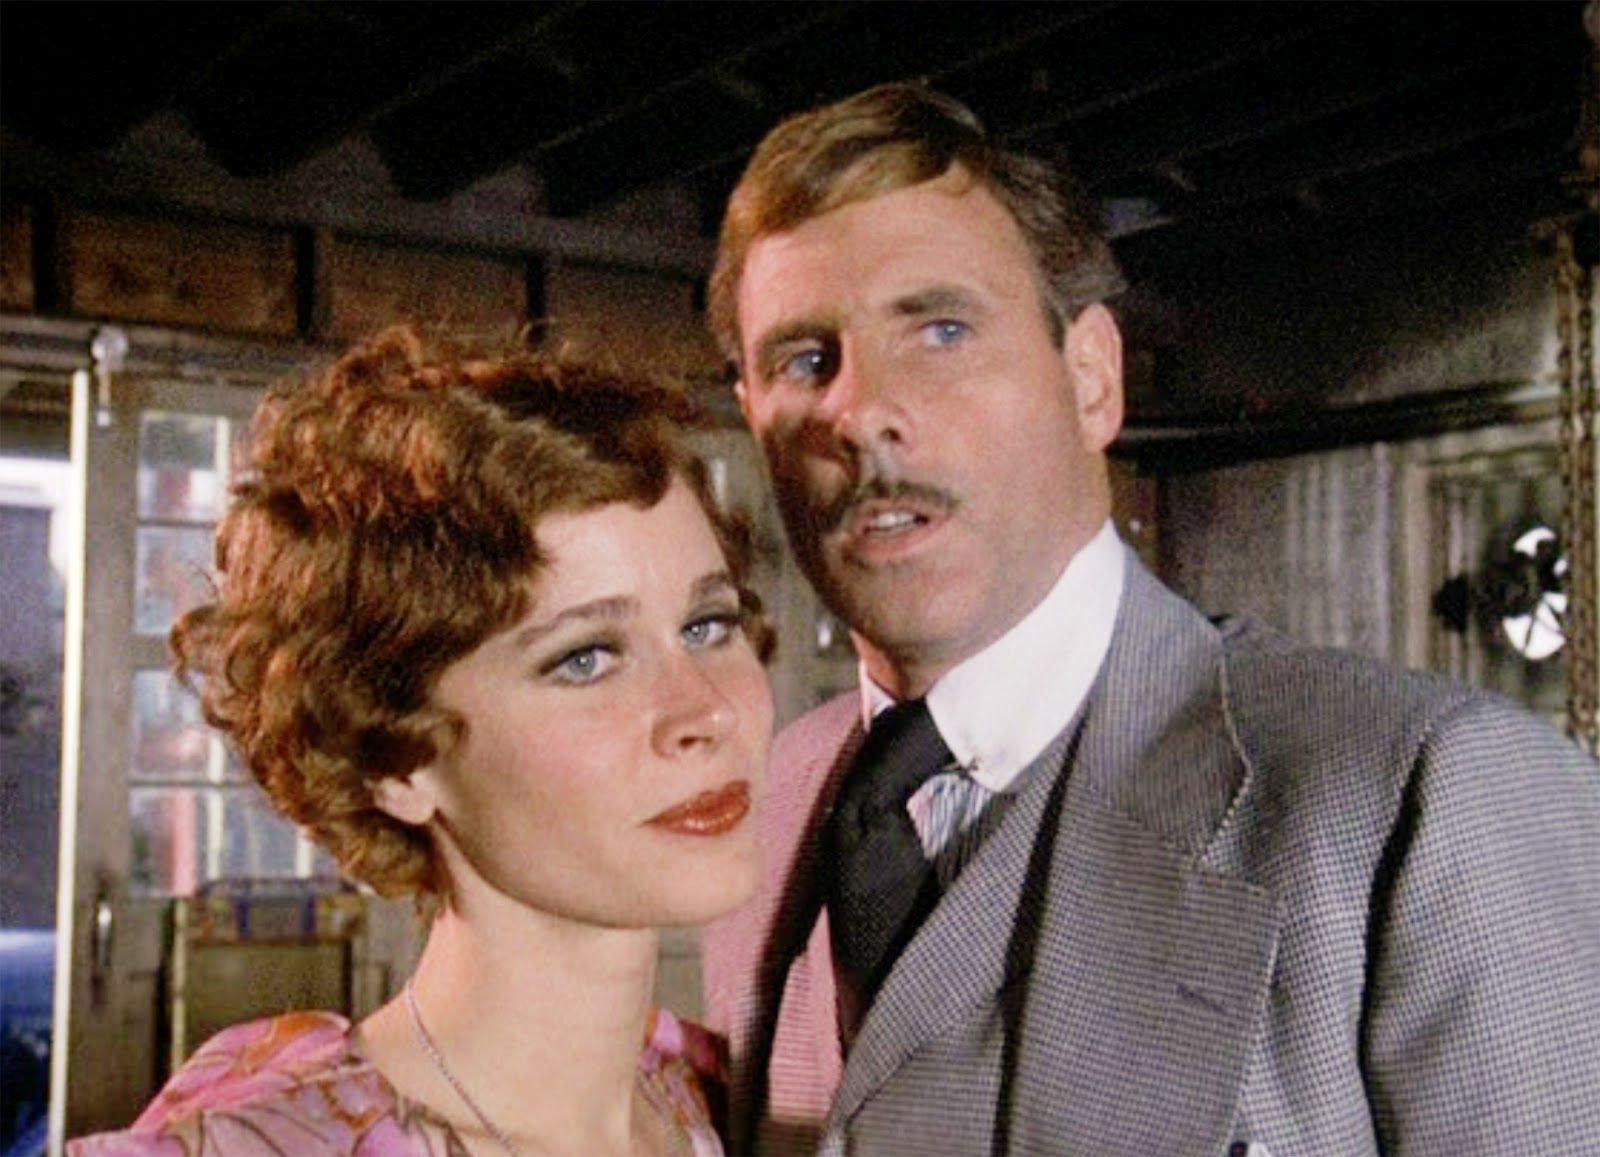 divorced parents college essay Tom Buchanan in the Great Gatsby